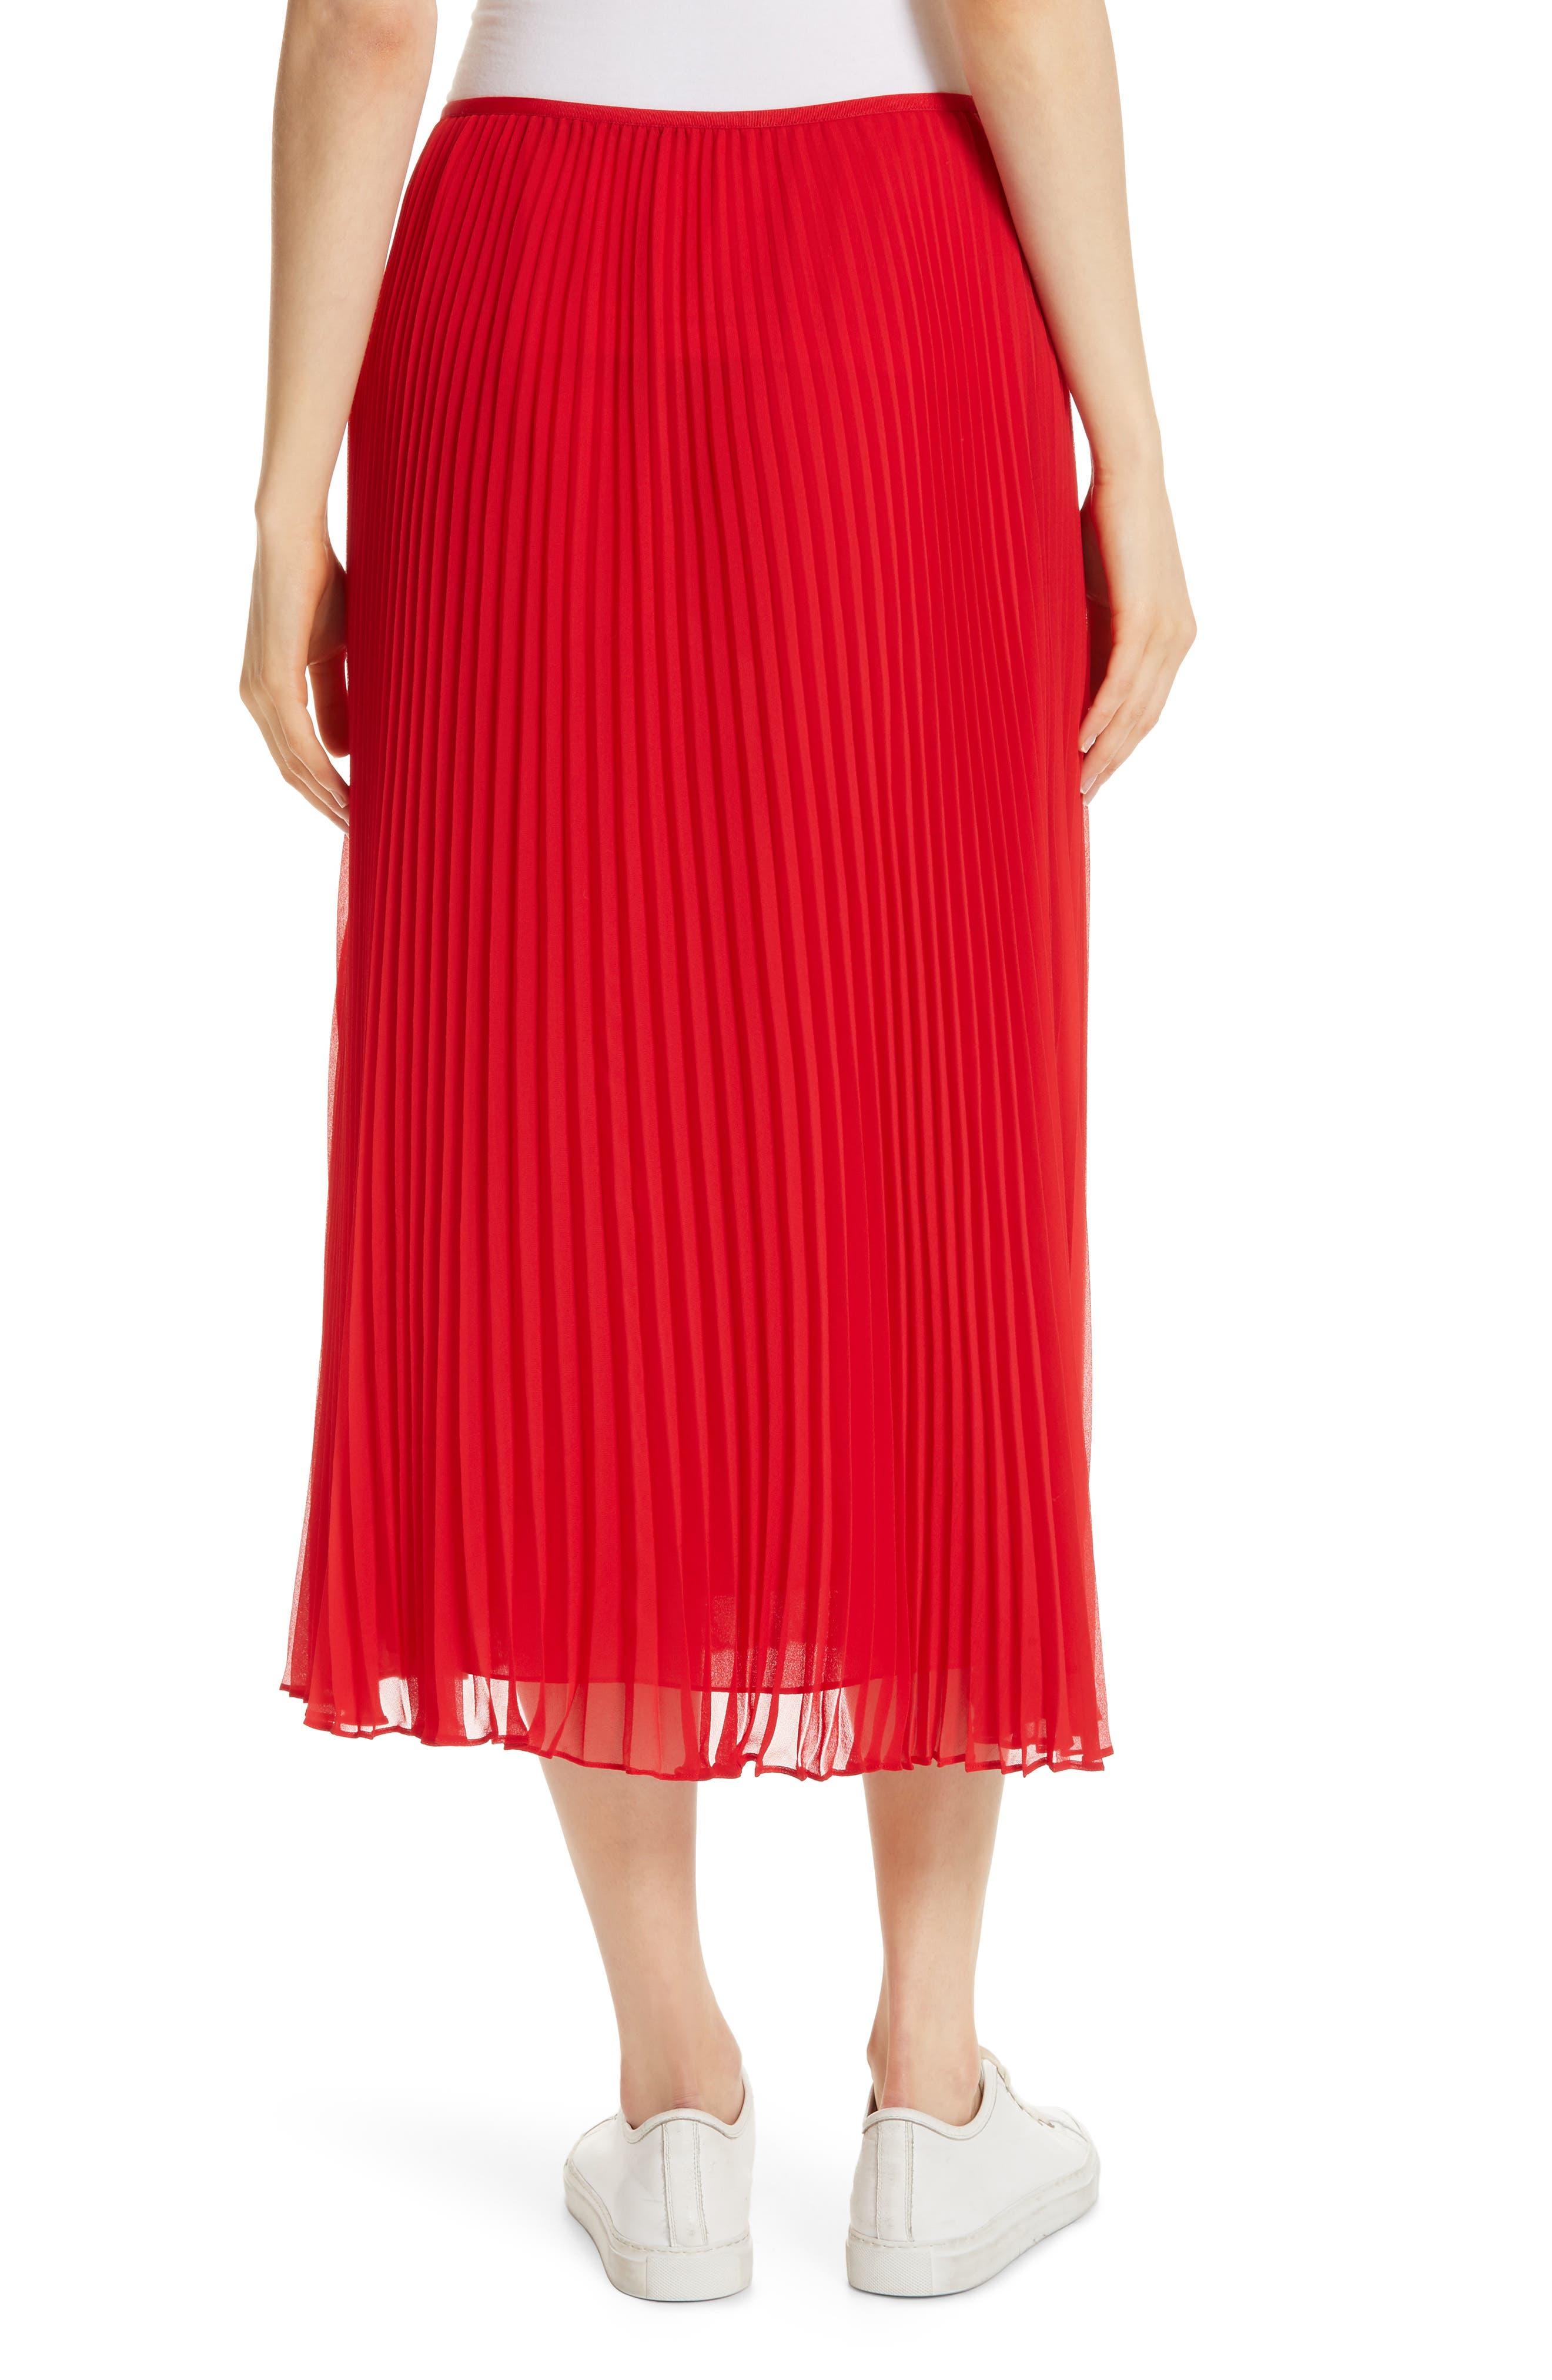 POLO RALPH LAUREN, Pleat Midi Skirt, Alternate thumbnail 2, color, PANDORA RED